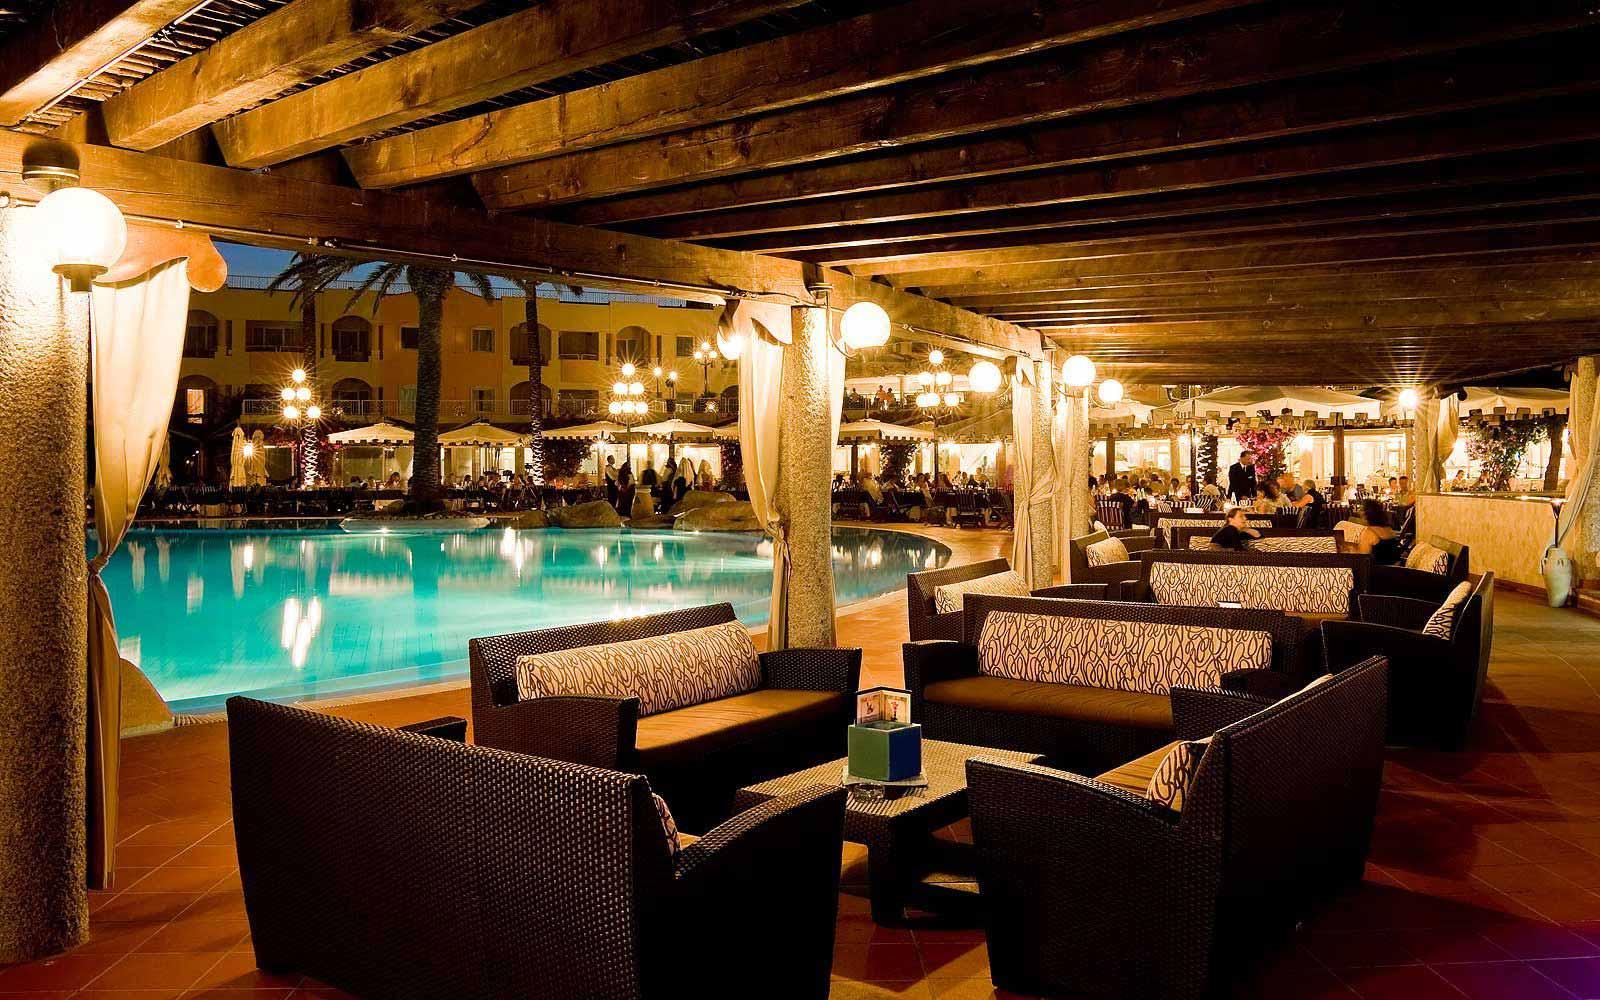 Pullman Timi Ama Sardegna's pool bar at night